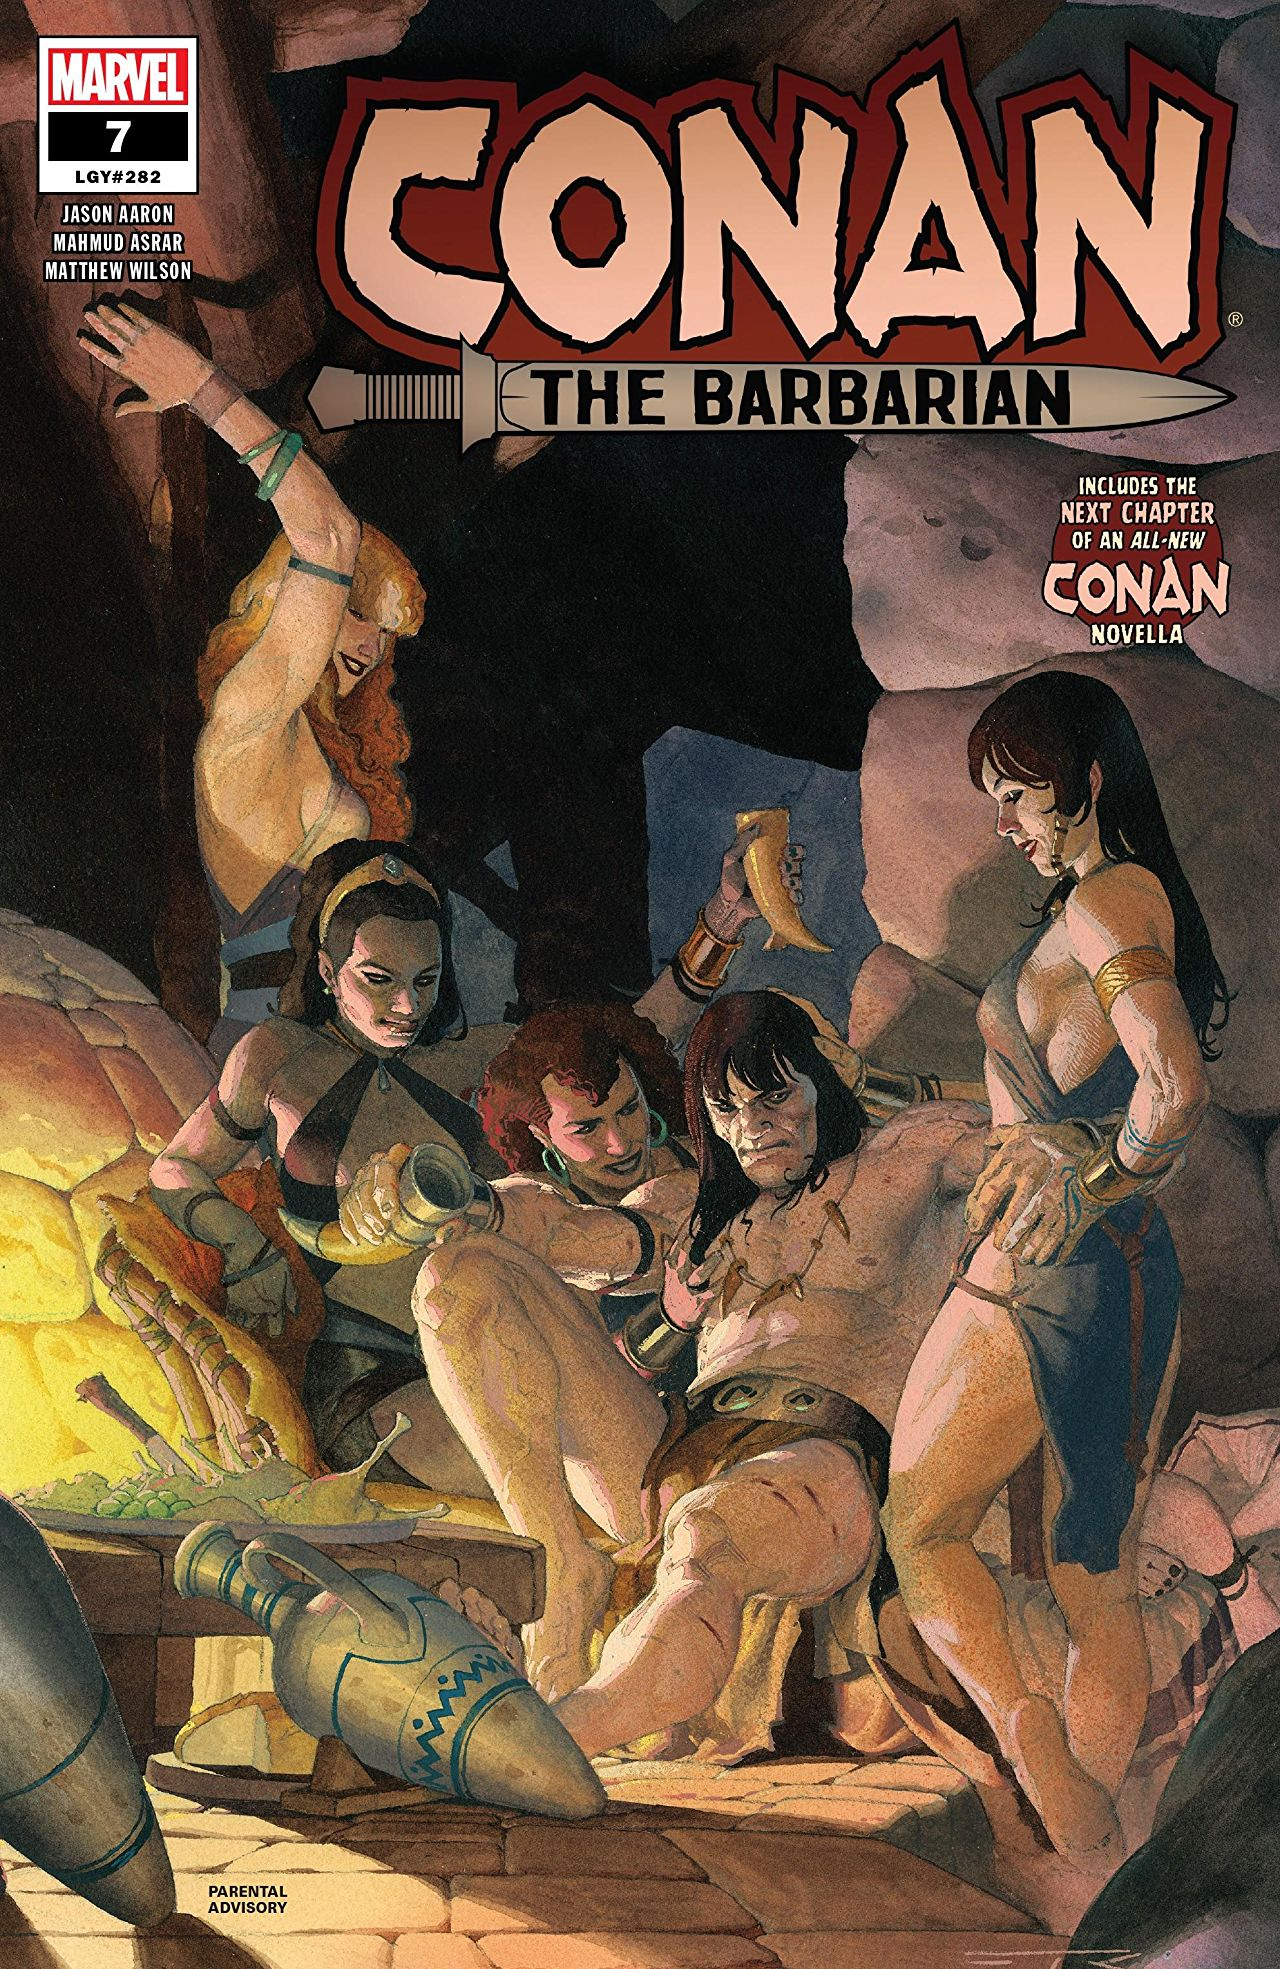 Conan the Barbarian Vol 3 7